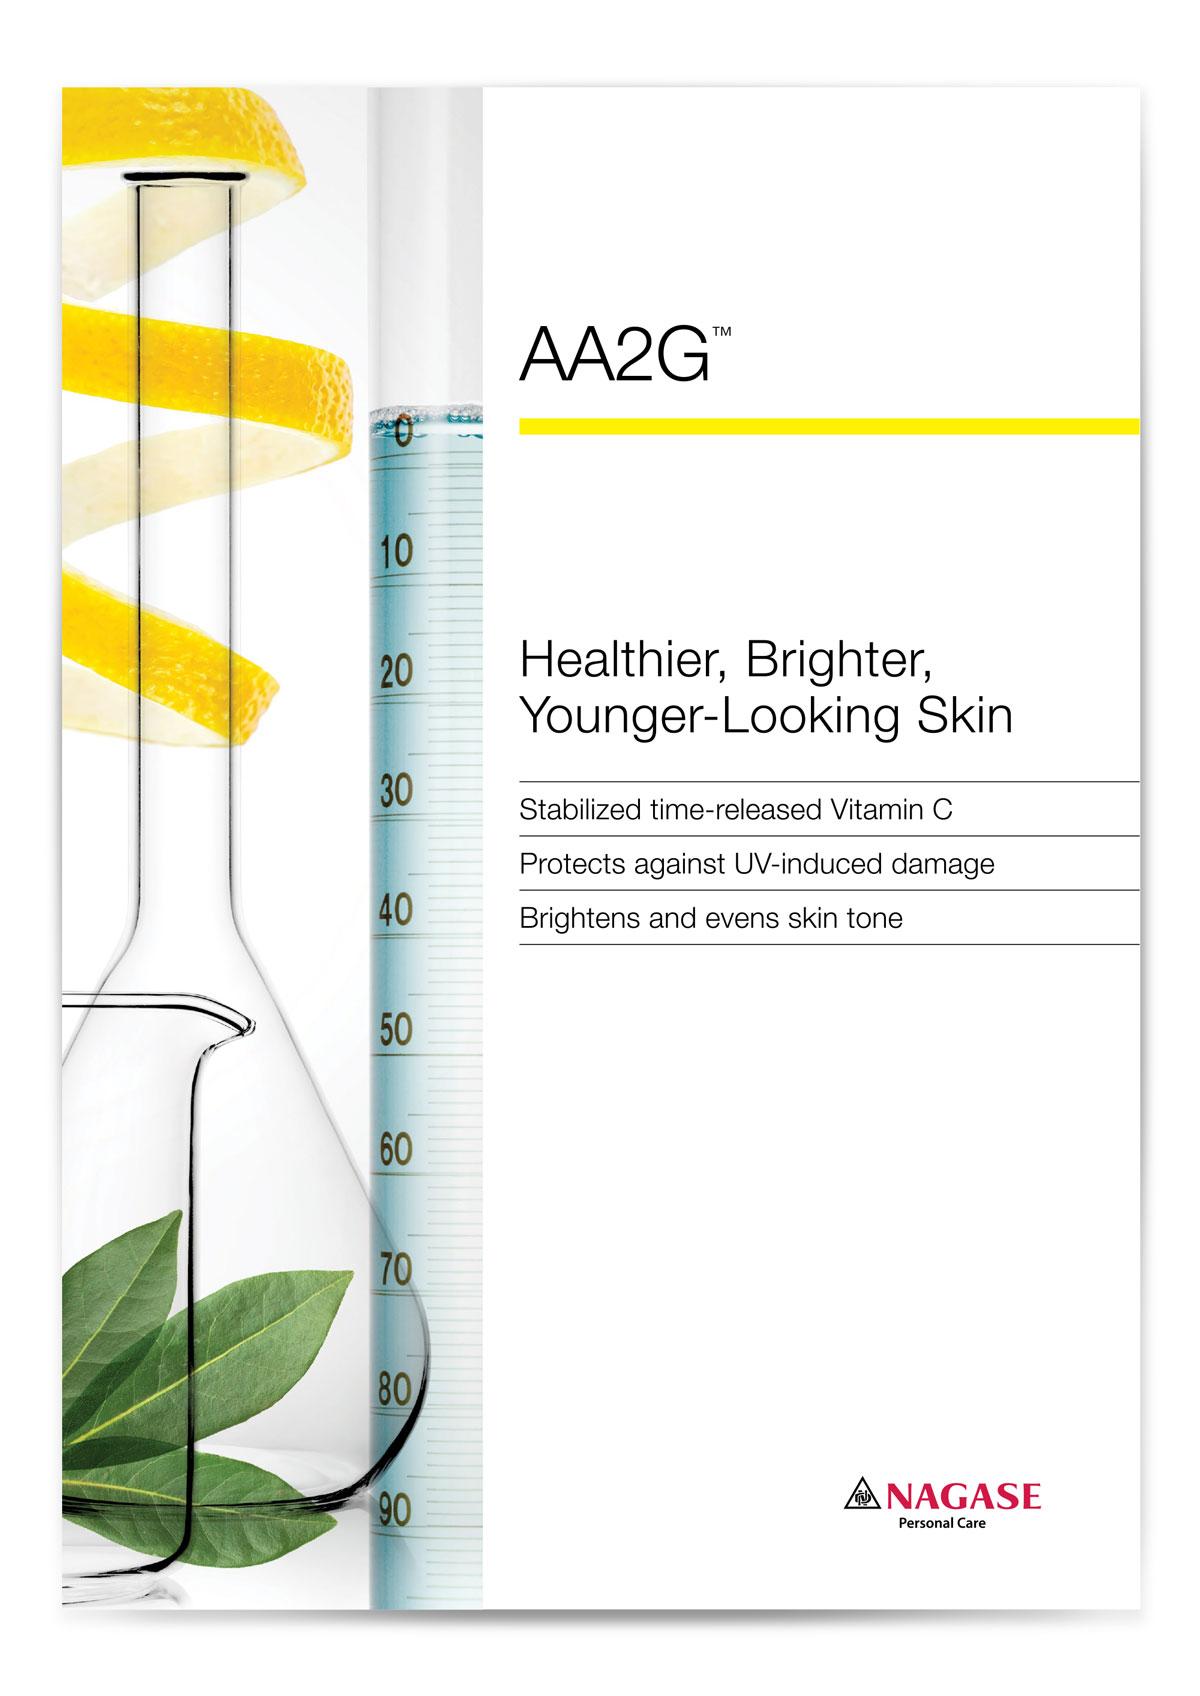 Nagase Brochure AA2G